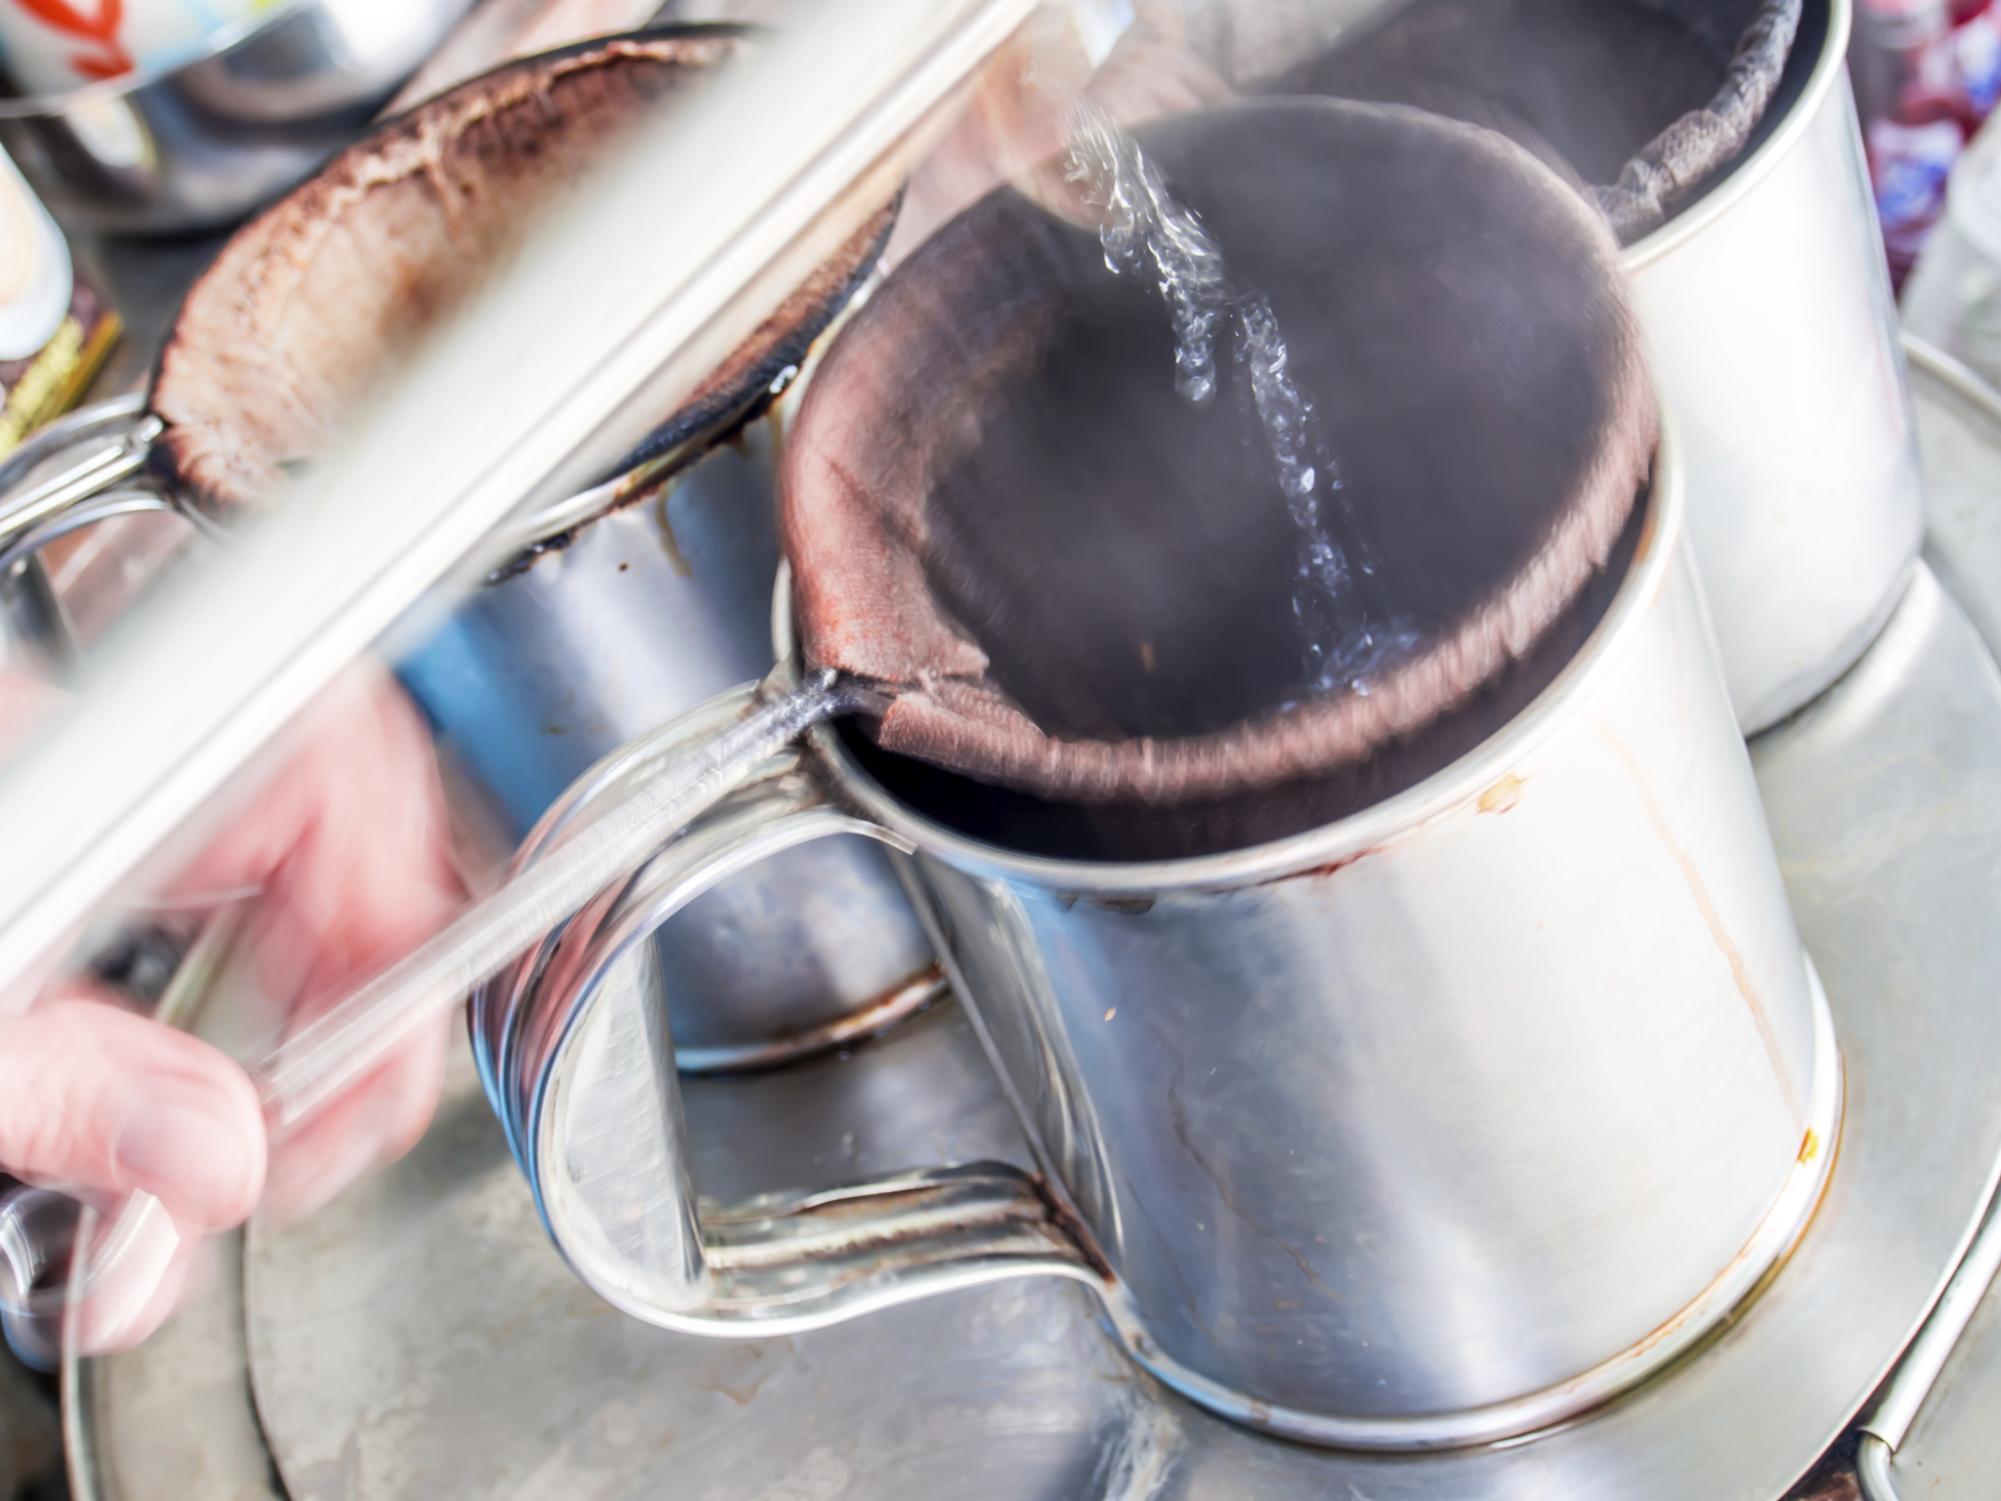 How to Open a Coffee Kiosk | Bizfluent